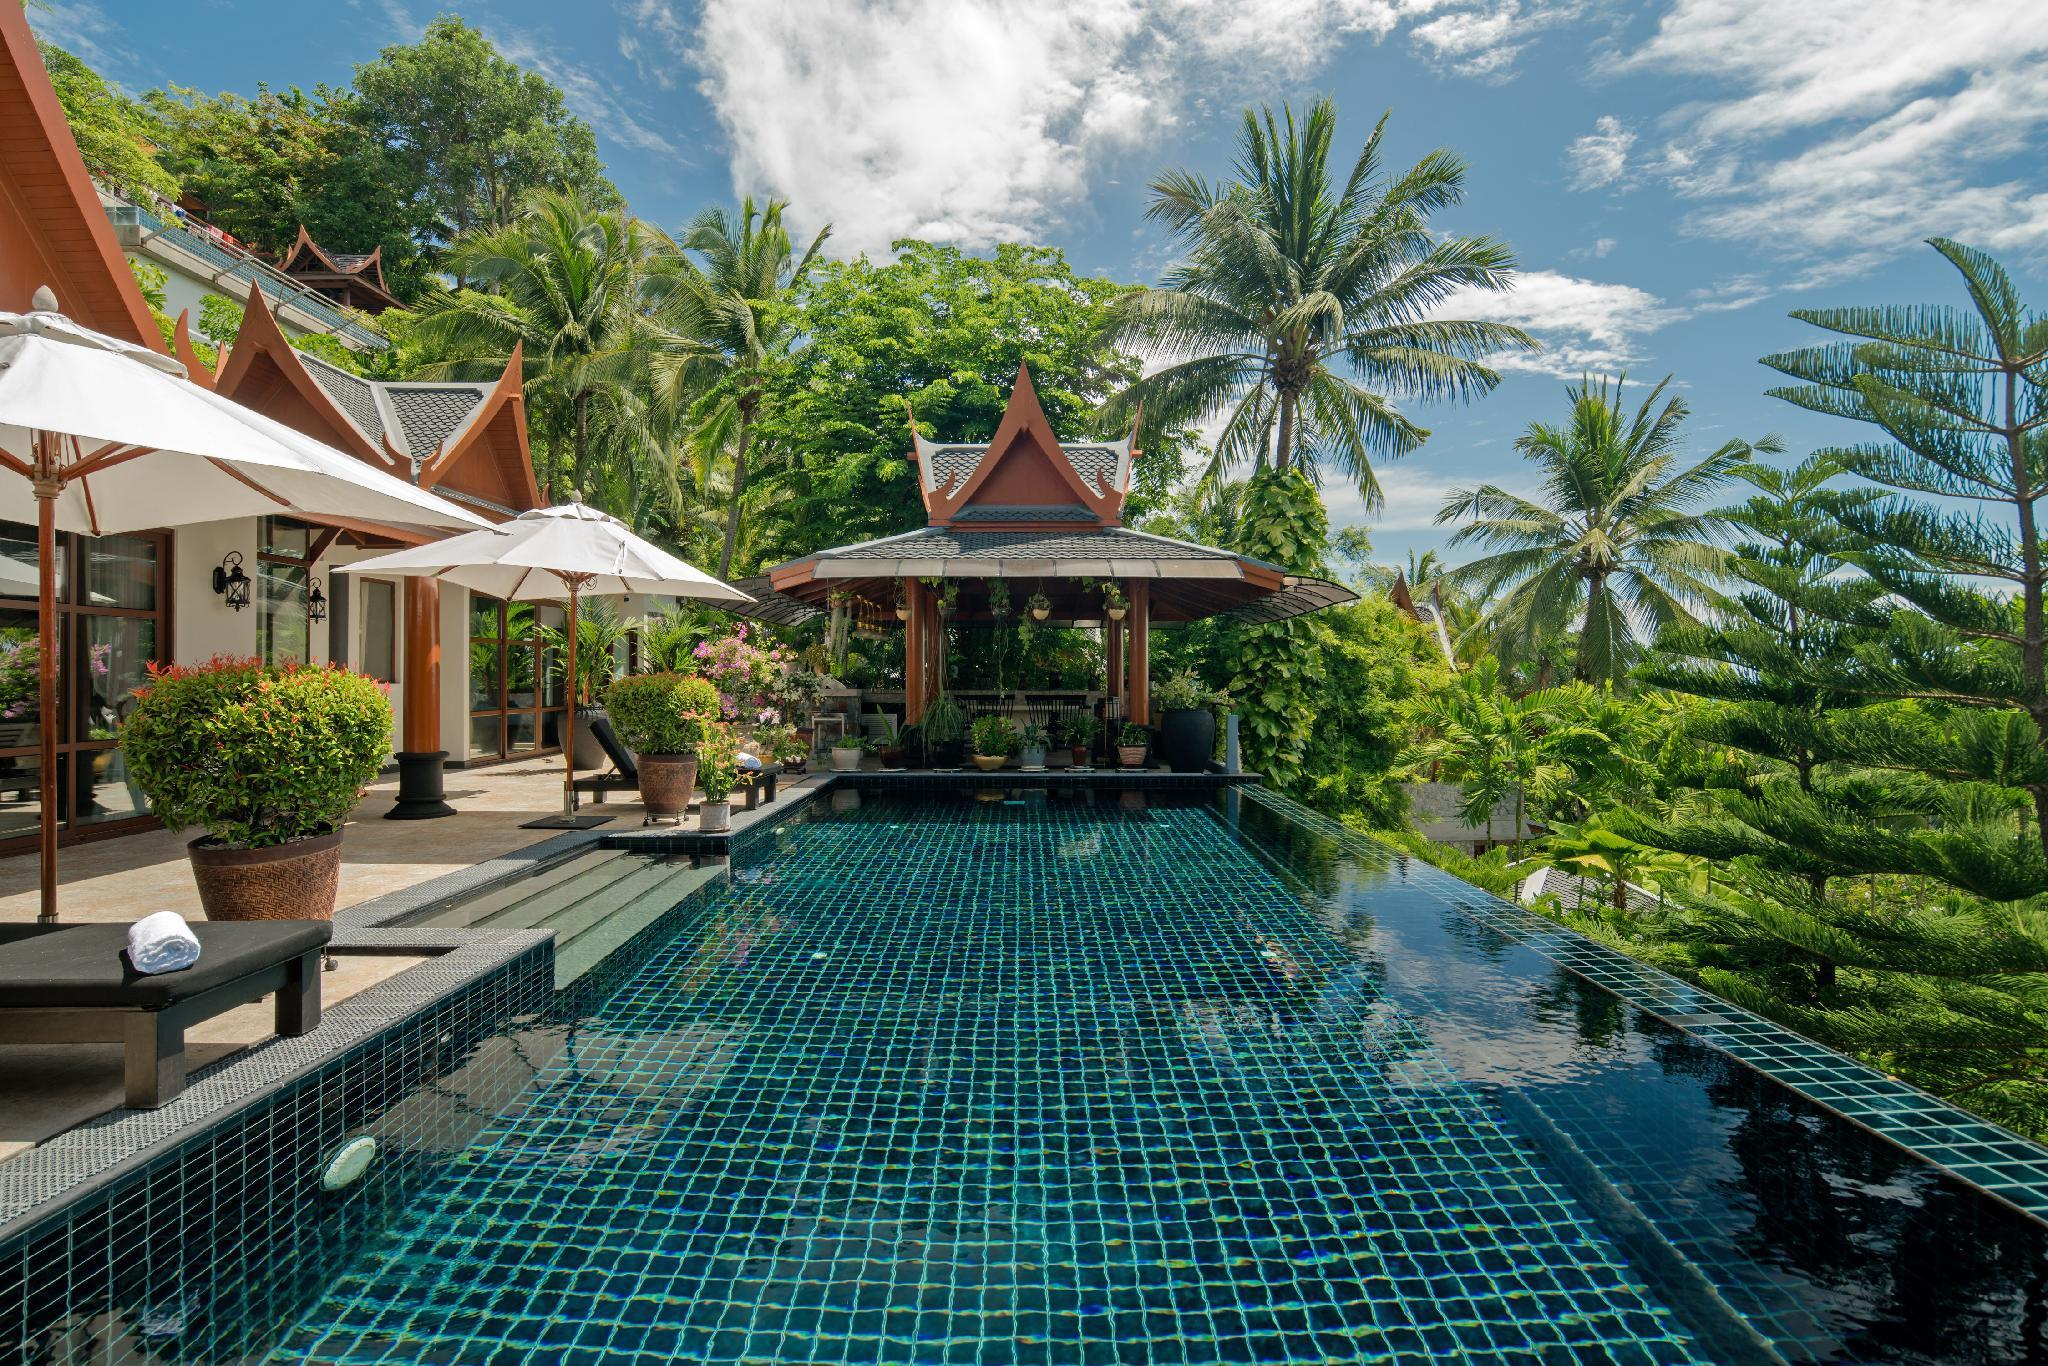 Ayara Hilltops 4BR Luxury Seaview Villa at Surin วิลลา 4 ห้องนอน 6 ห้องน้ำส่วนตัว ขนาด 1044 ตร.ม. – สุรินทร์